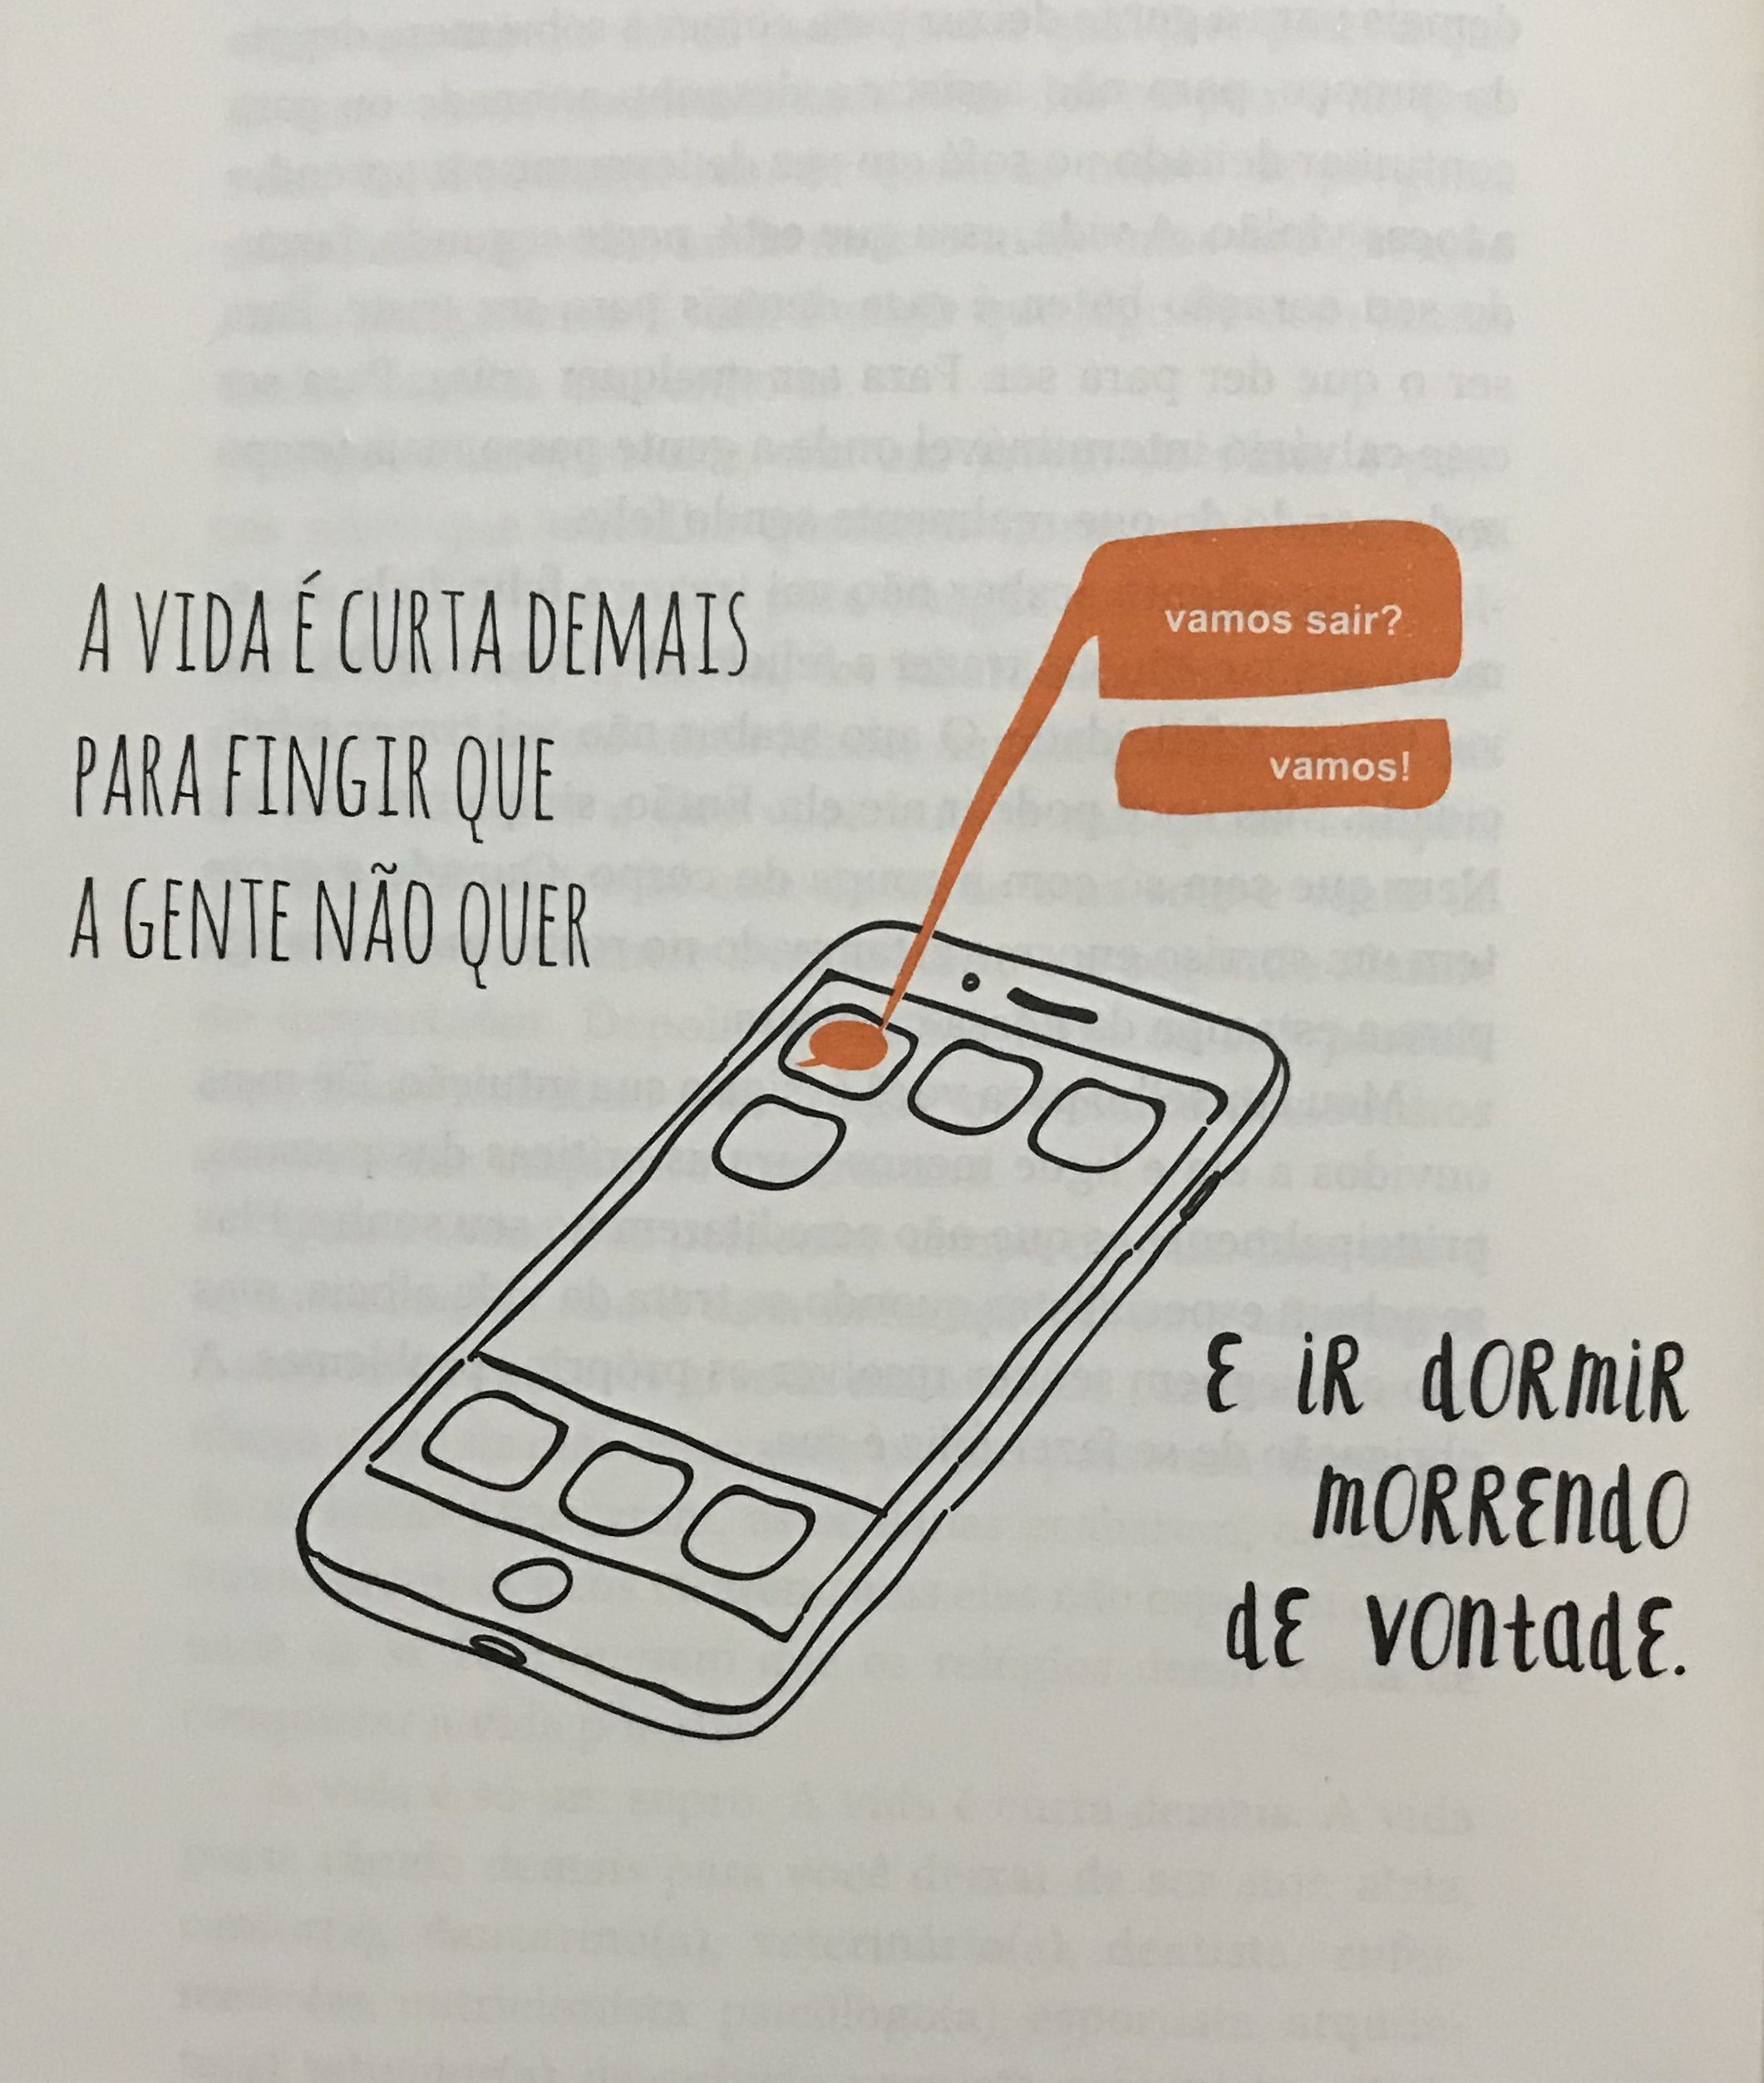 Pin De Ninna Rodrigues Em Tal Sentimento Frases Motivacionais